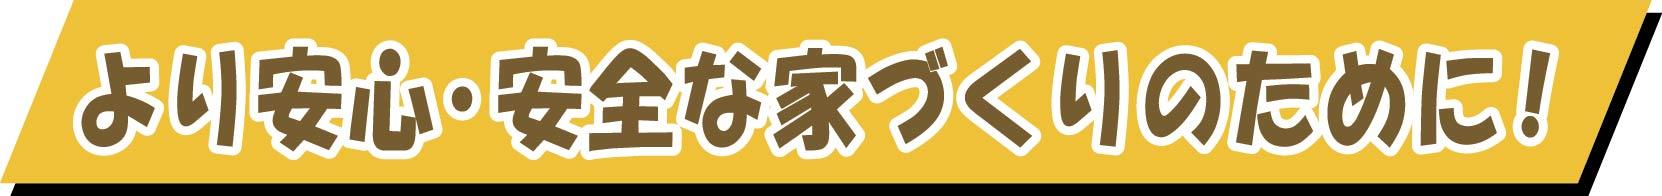 KuraSi-natu-sin83-04.jpg